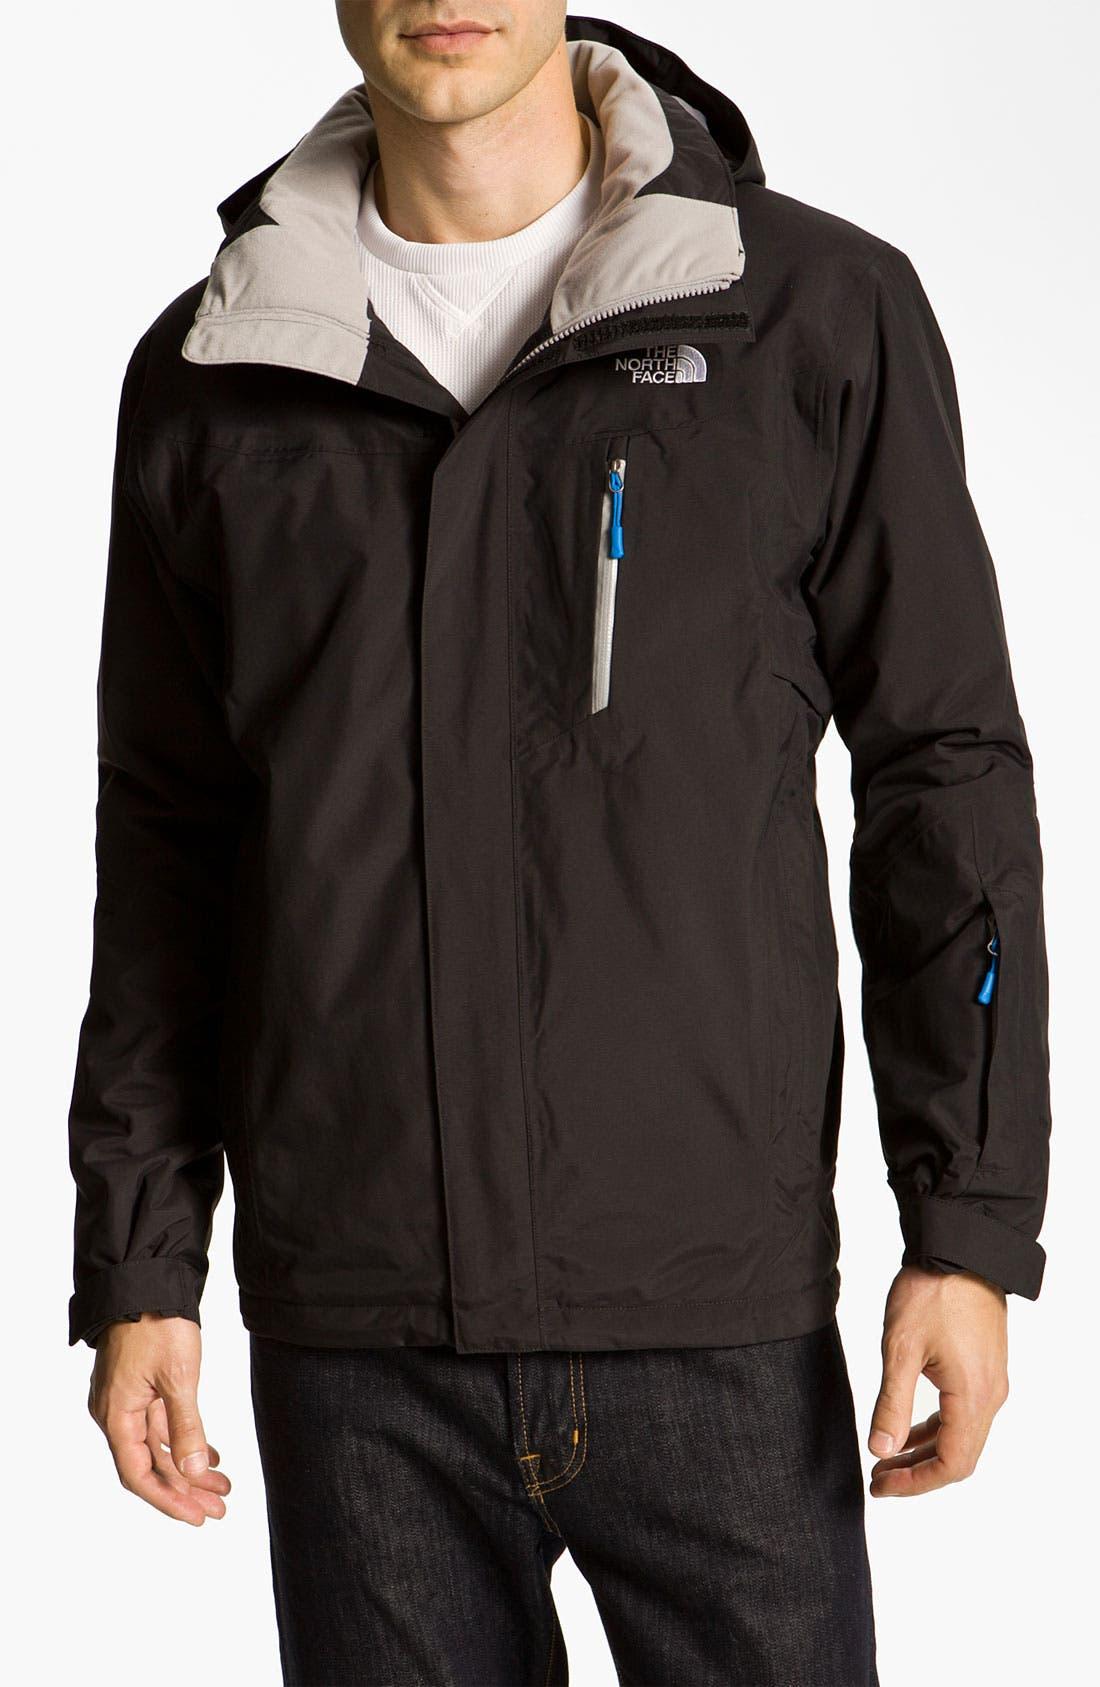 Alternate Image 1 Selected - The North Face 'Peskara' Jacket